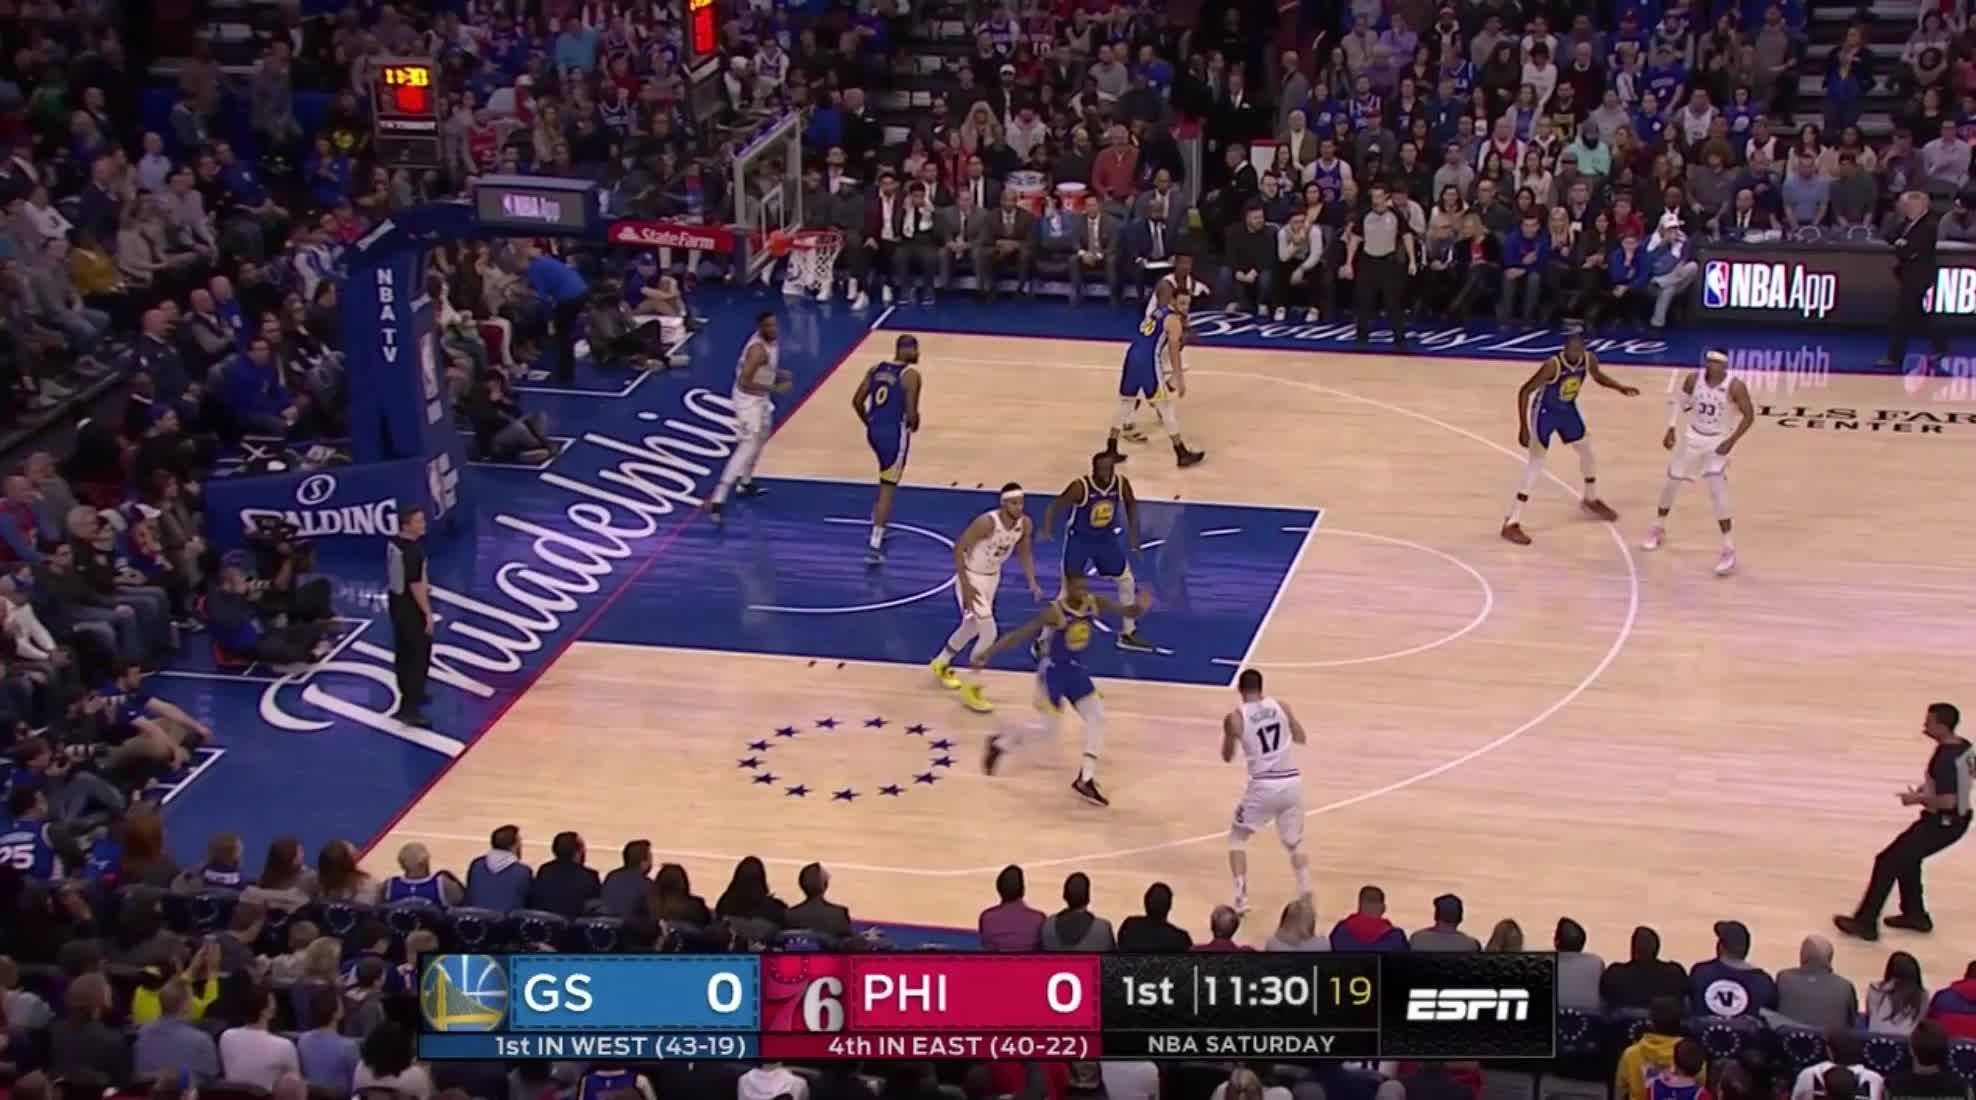 Jonah BOlden, NBA, Philadelphia 76ers, Sixers, basketball, Jonah Bolden Hard Drive GSW GIFs